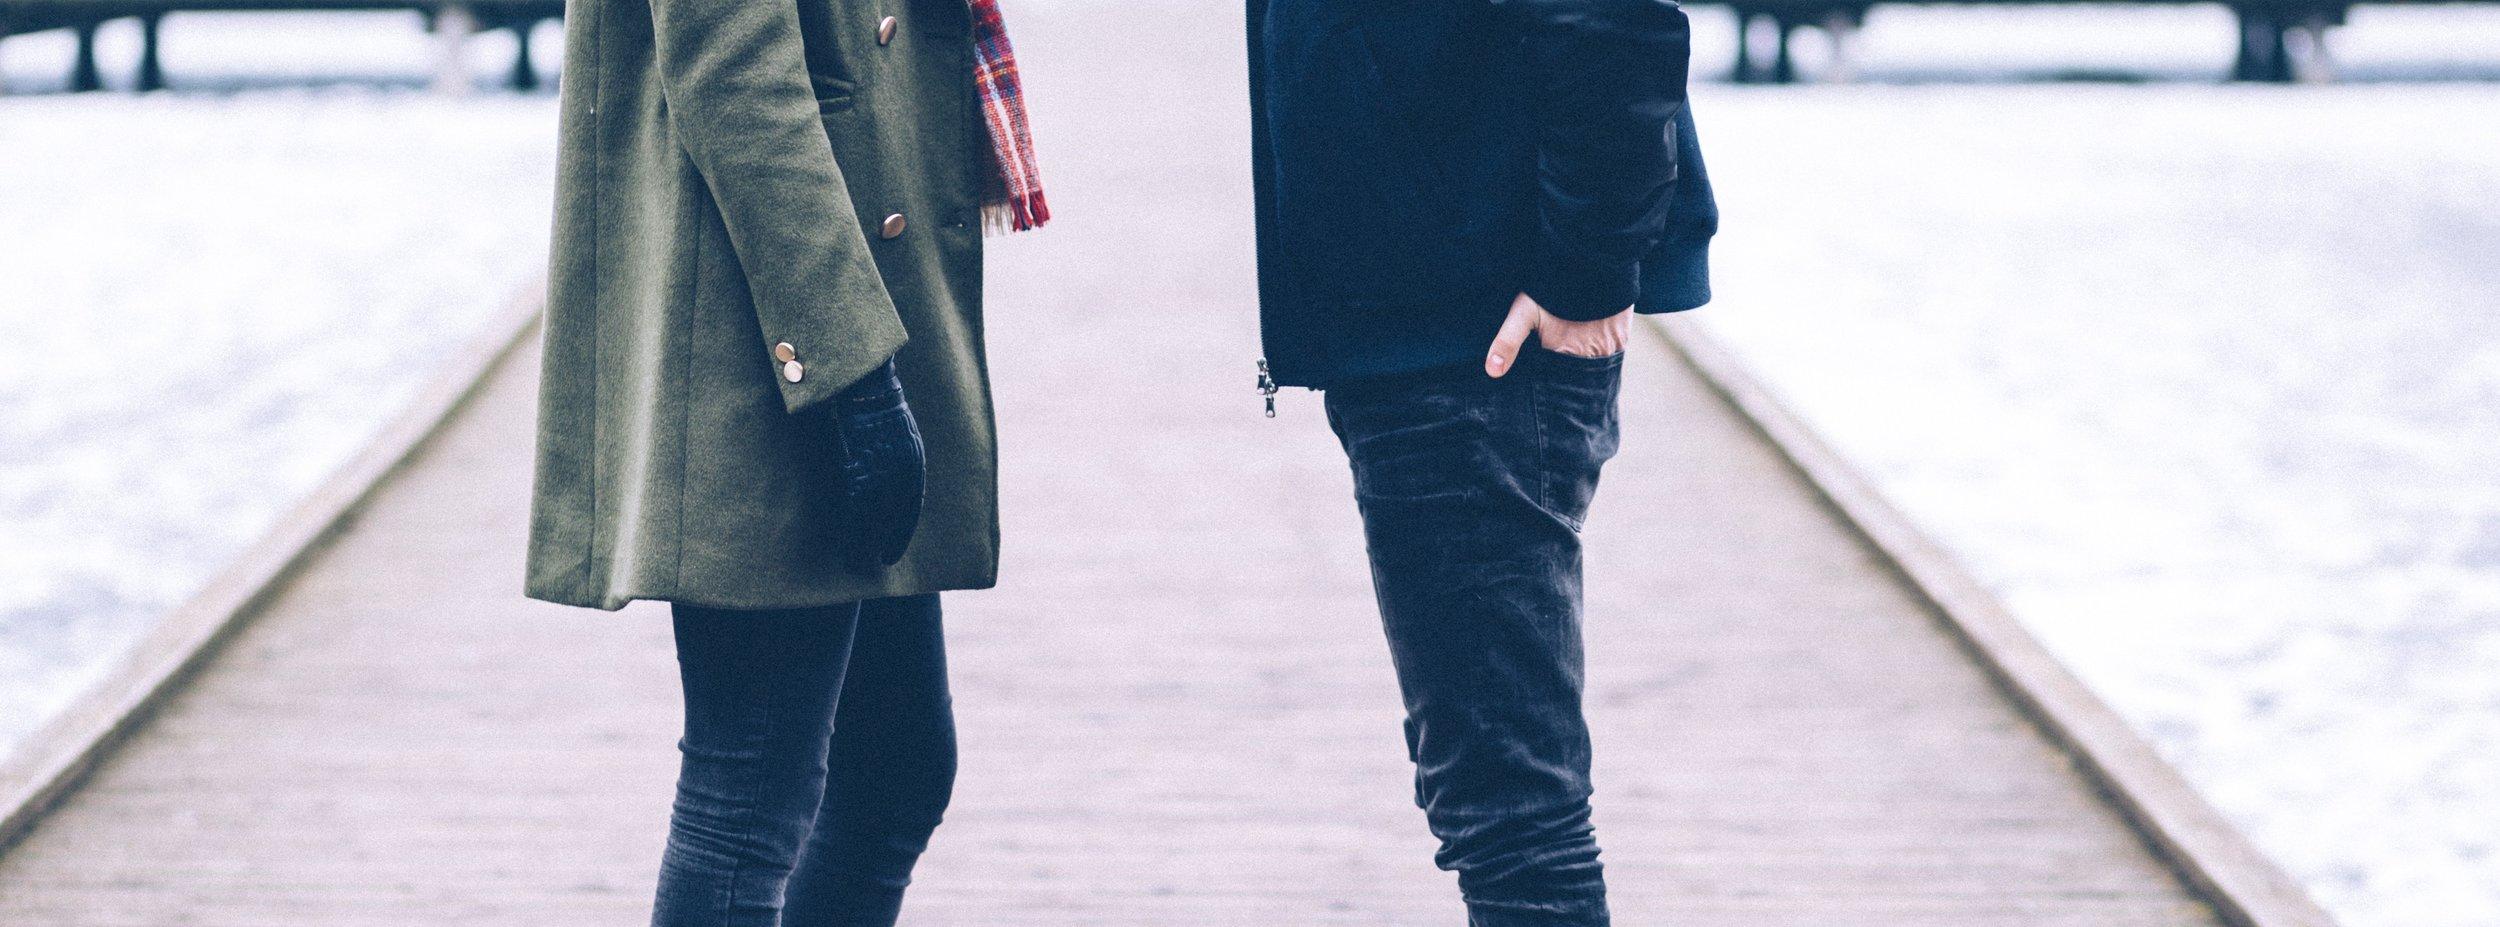 blue-jeans-blur-clothes-349494.jpg